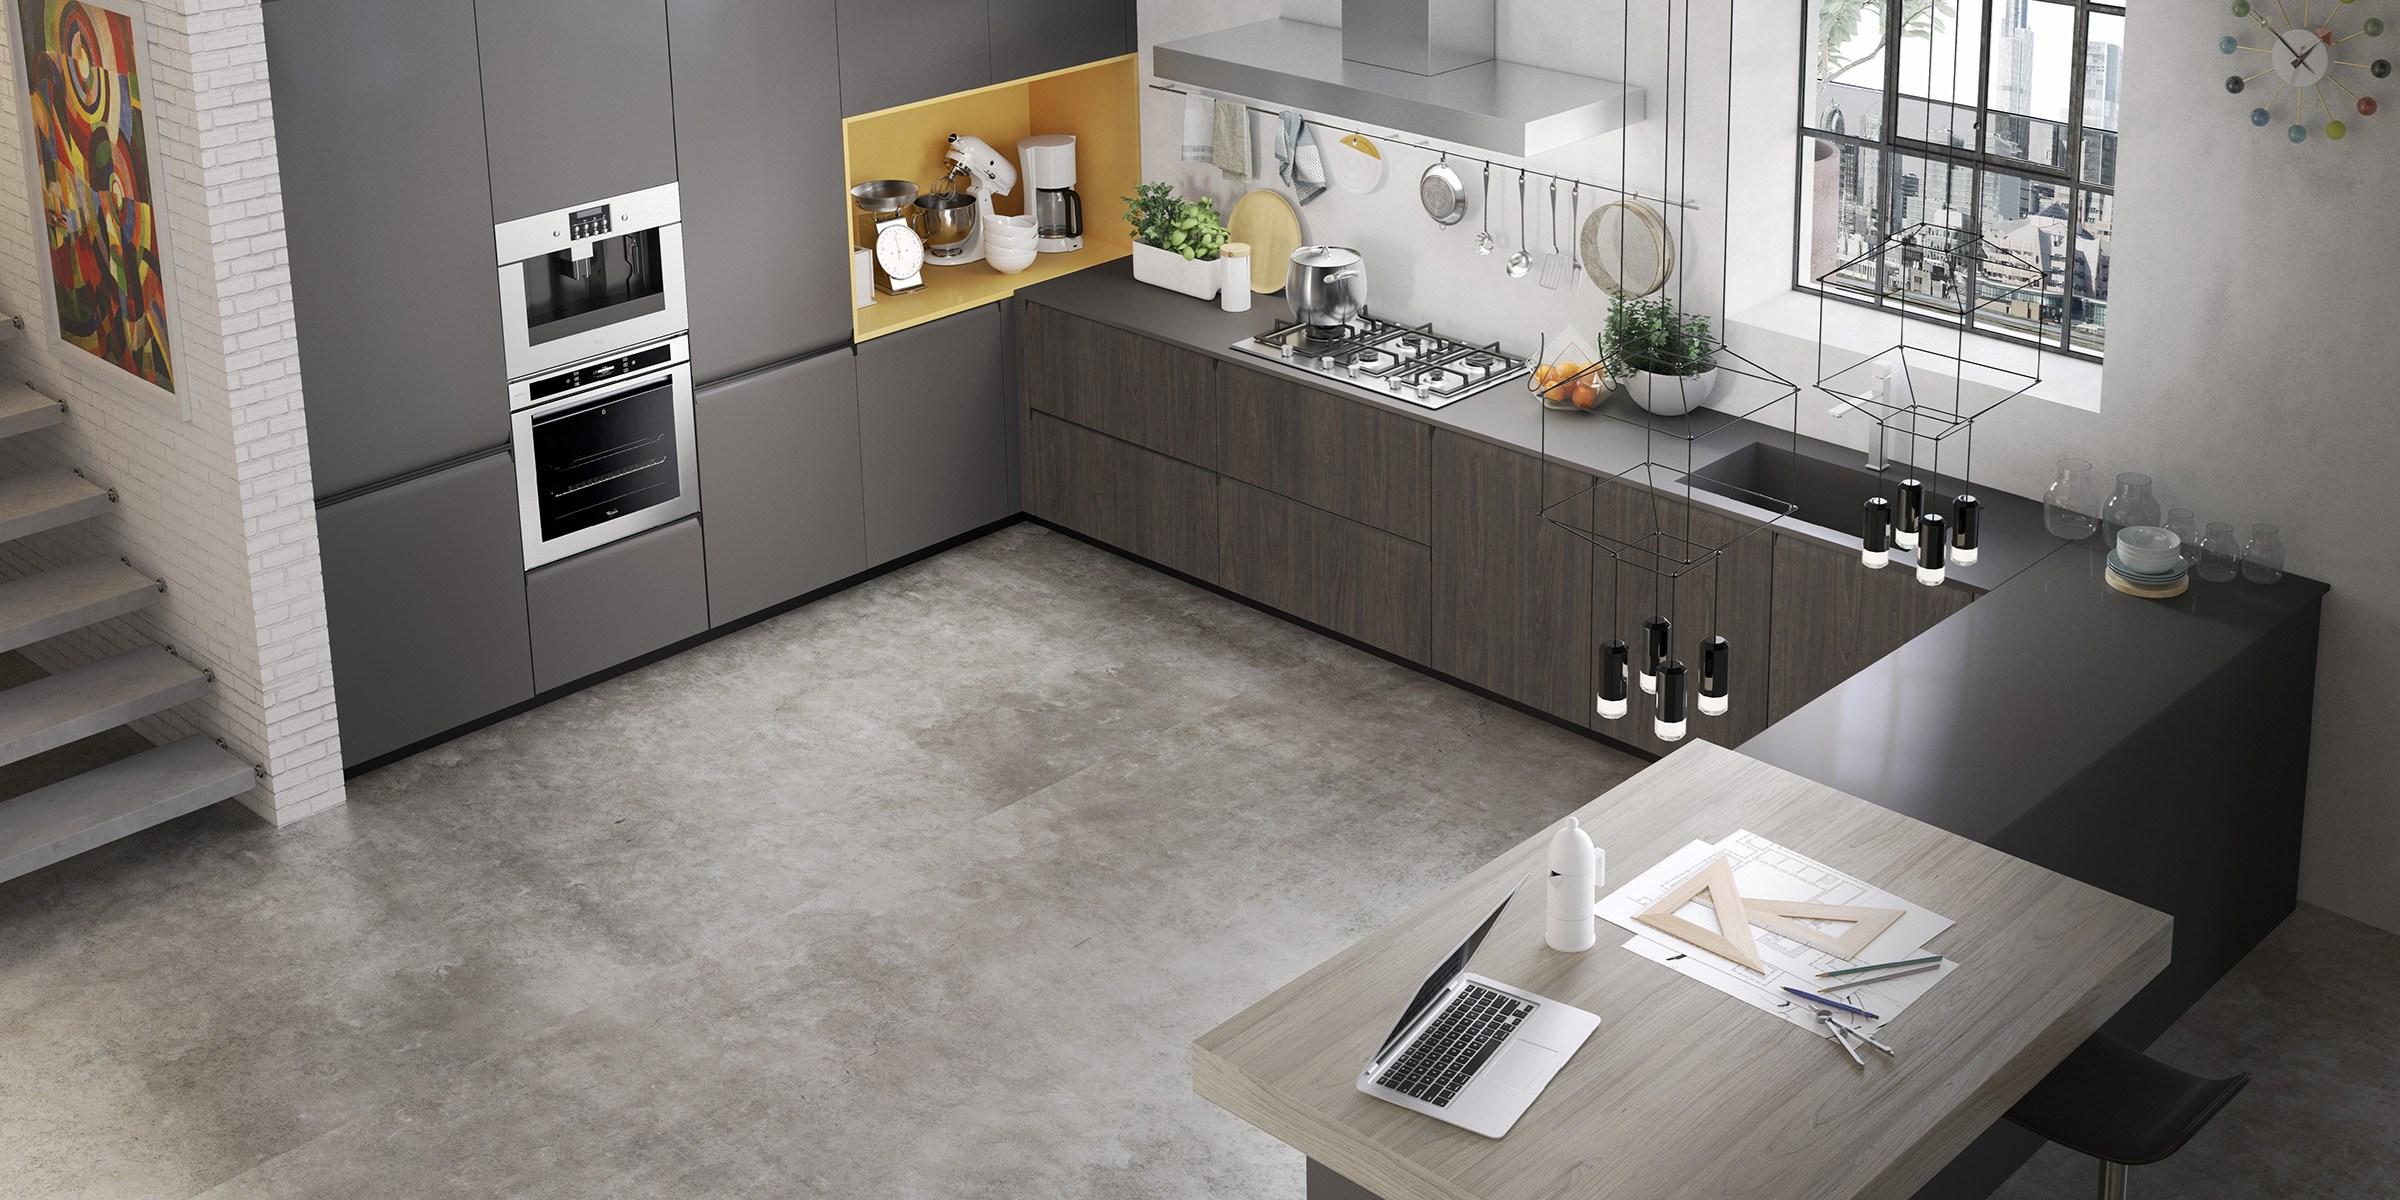 Del tongo gibilterra mobili gala for Cucine moderne ad angolo